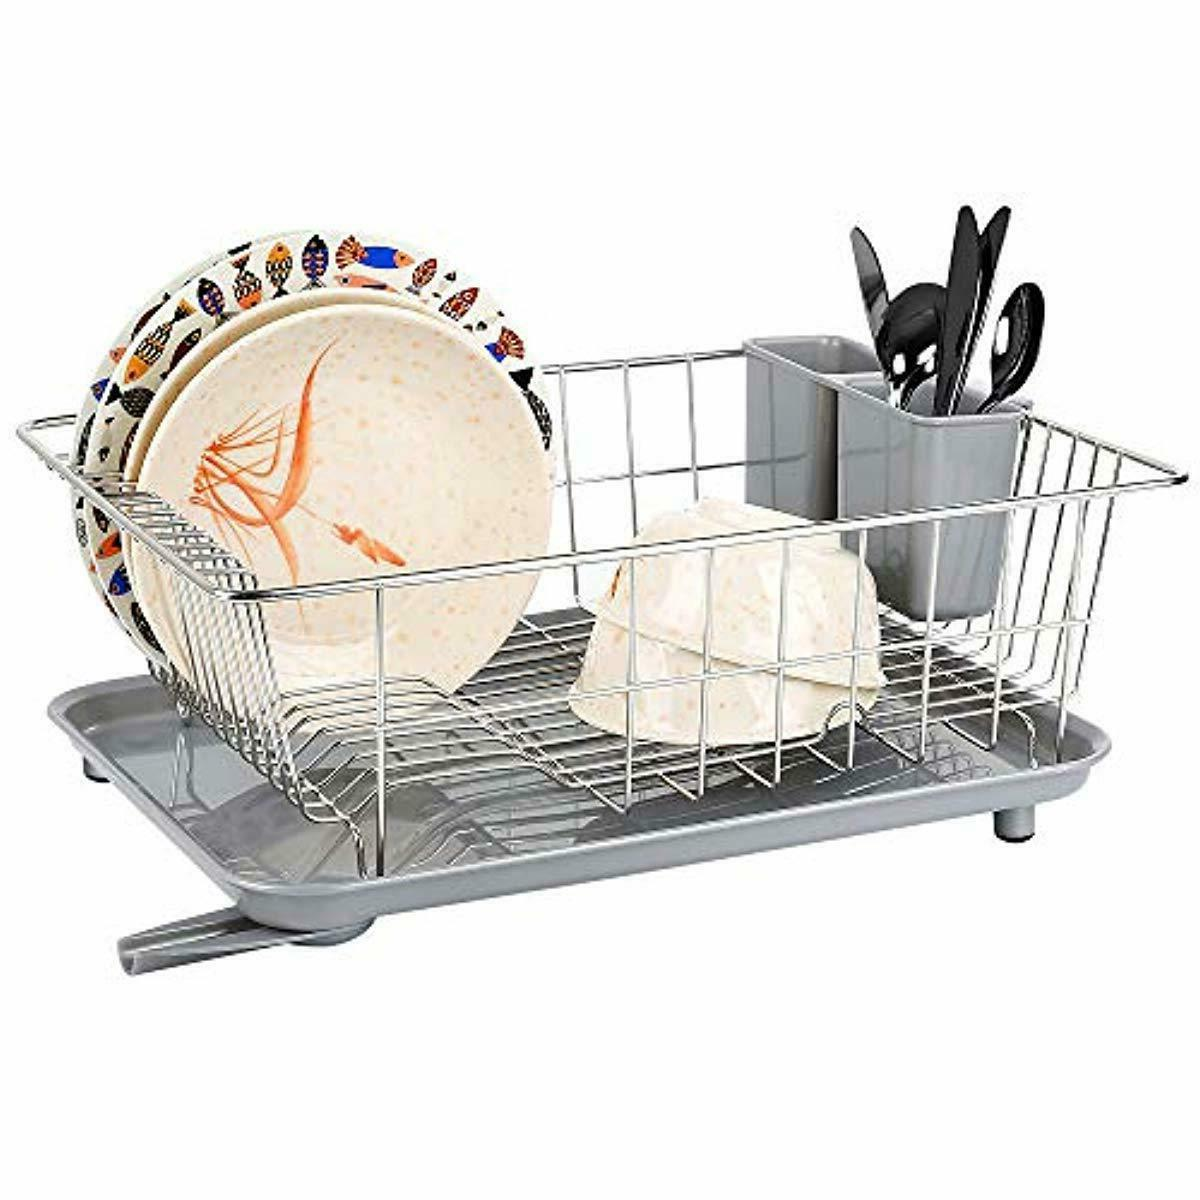 Dish Drying Rack Drain Whitgo Steel